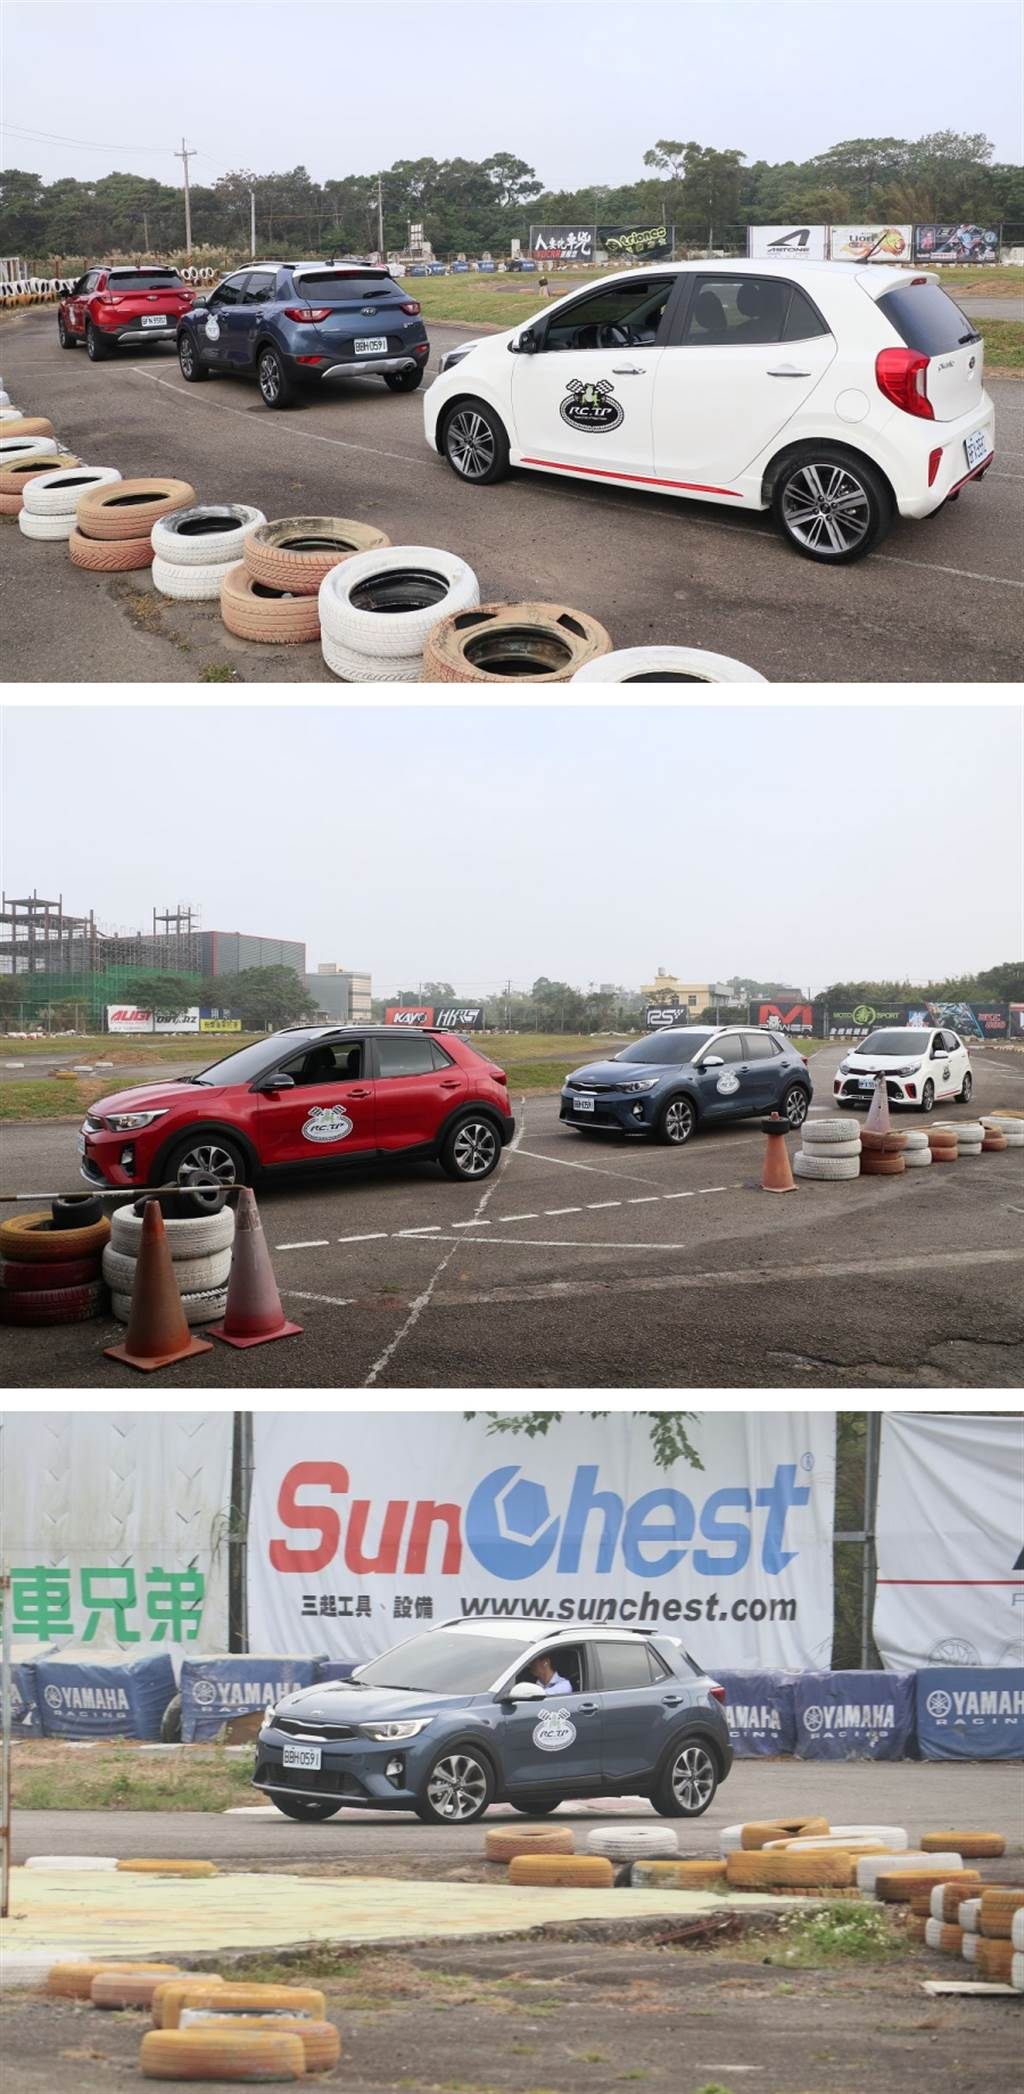 KIA台灣森那美起亞汽車贊助台北動力扶輪社第二屆極限駕駛體驗營車輛